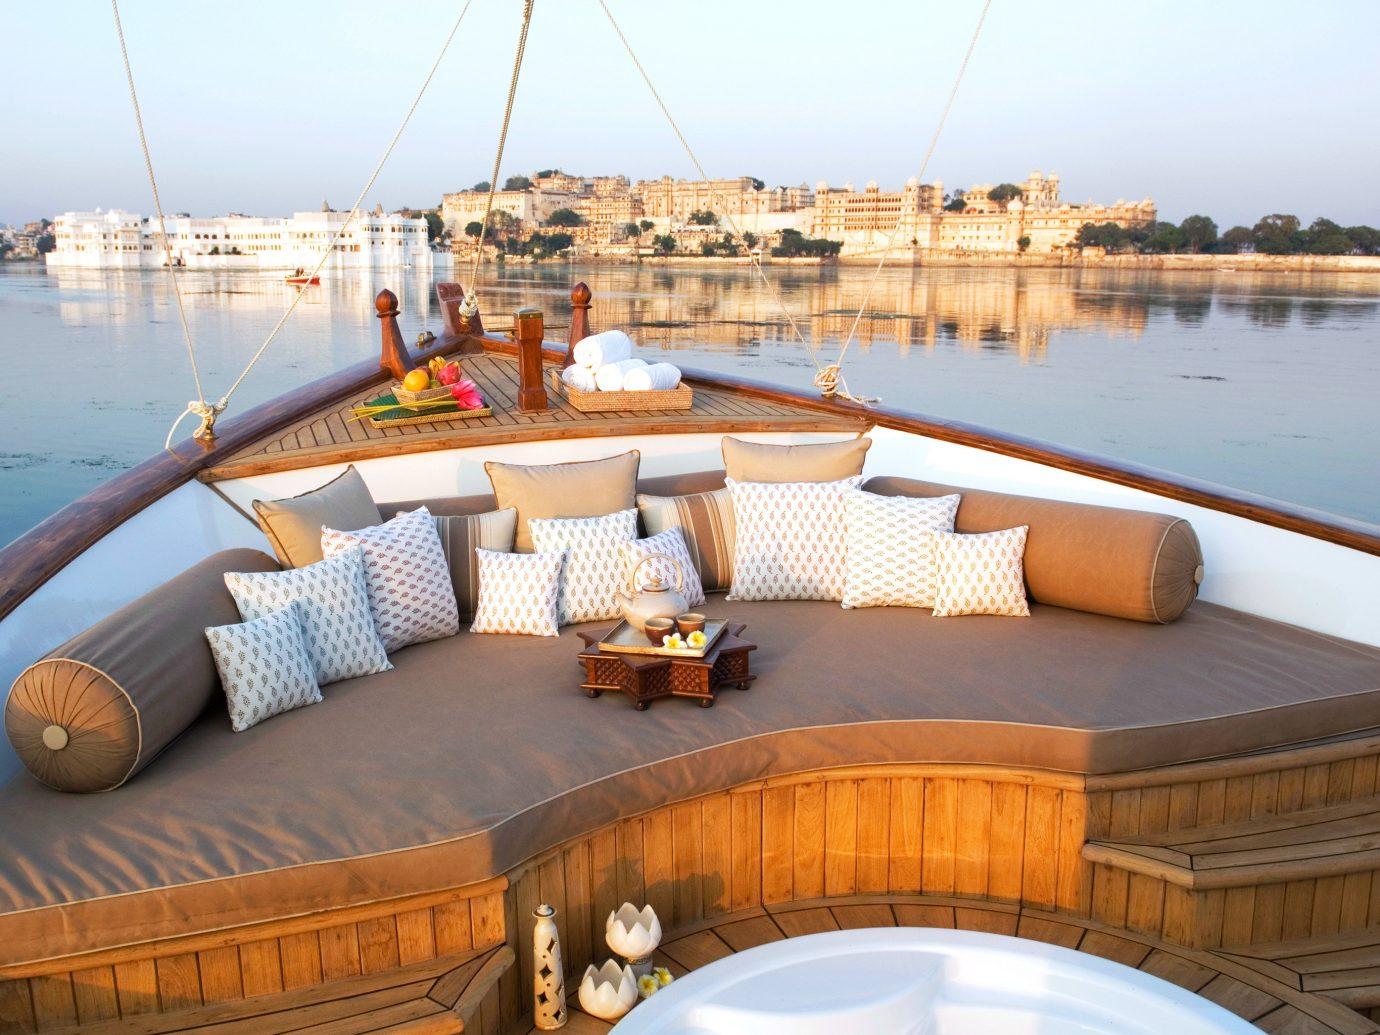 Boat Elegant Luxury Resort Scenic views Travel Tips Waterfront sky water vehicle passenger ship outdoor ship yacht luxury yacht watercraft estate